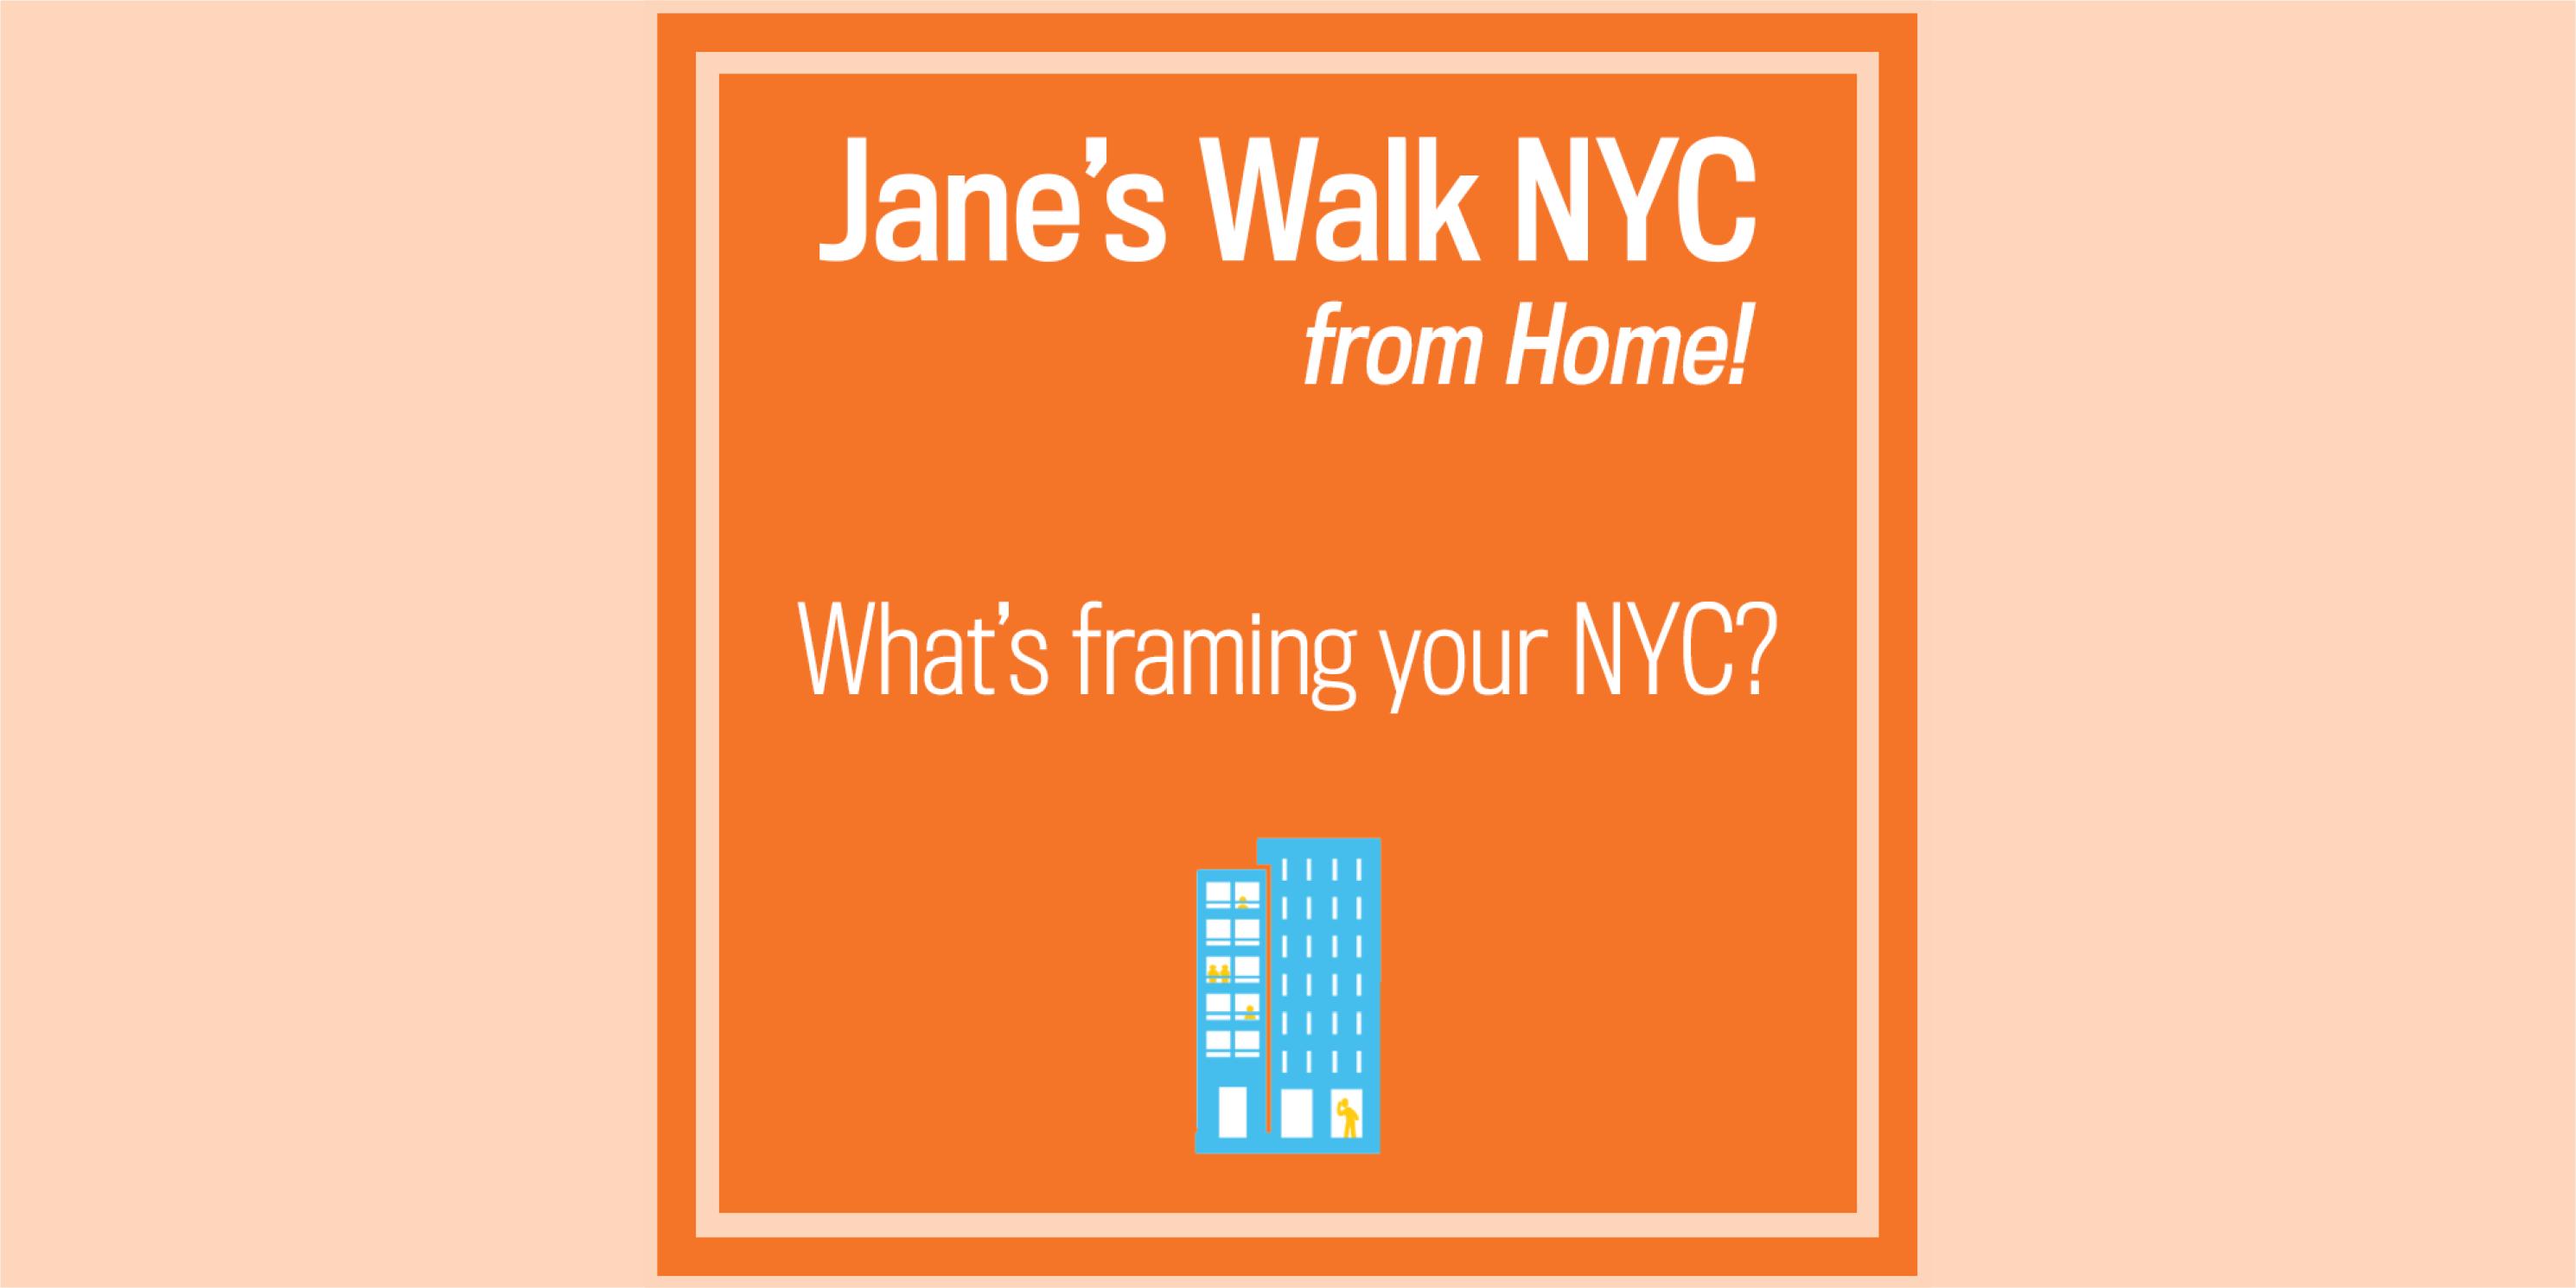 Advertisement for Jane's Walk 2020, Day 3 activities